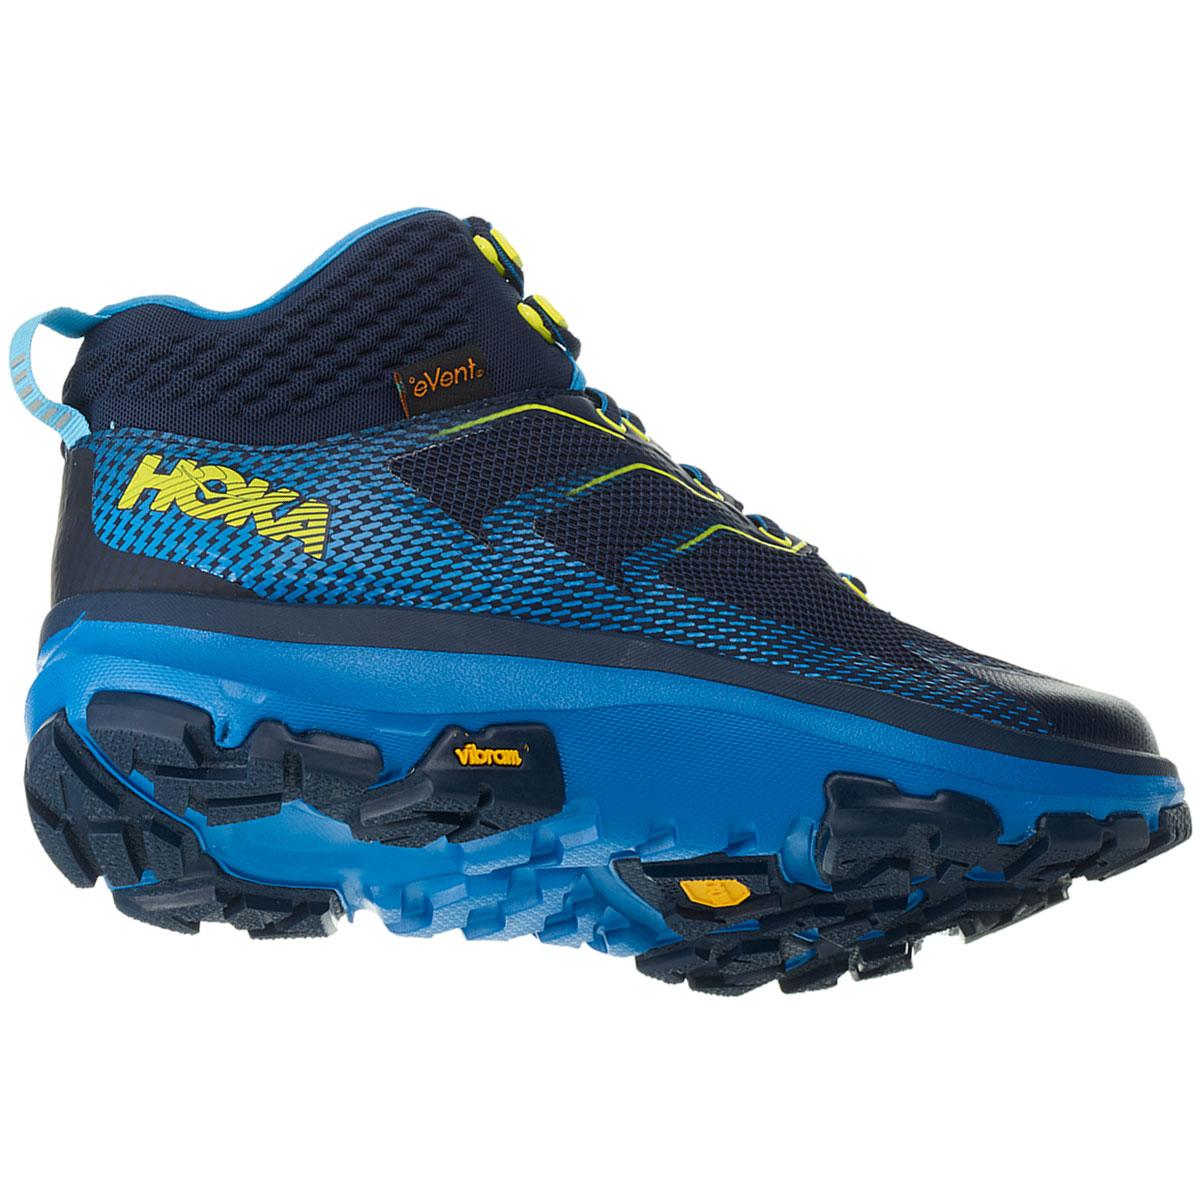 Men's Hoka One One Sky Toa Gore-Tex Trail Running Shoe - Color: Black Iris/Blue - Size: 7 - Width: Regular, Black Iris/Blue, large, image 3